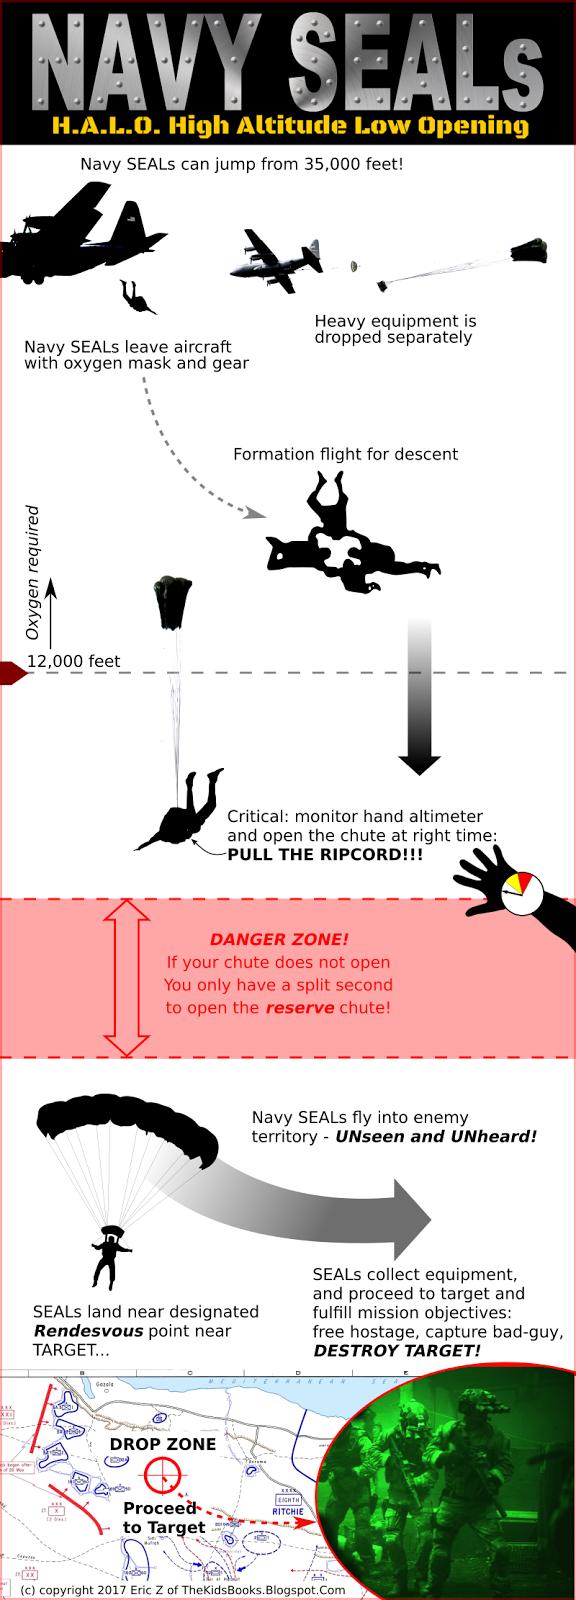 Navy SEALs HALO infographic 2